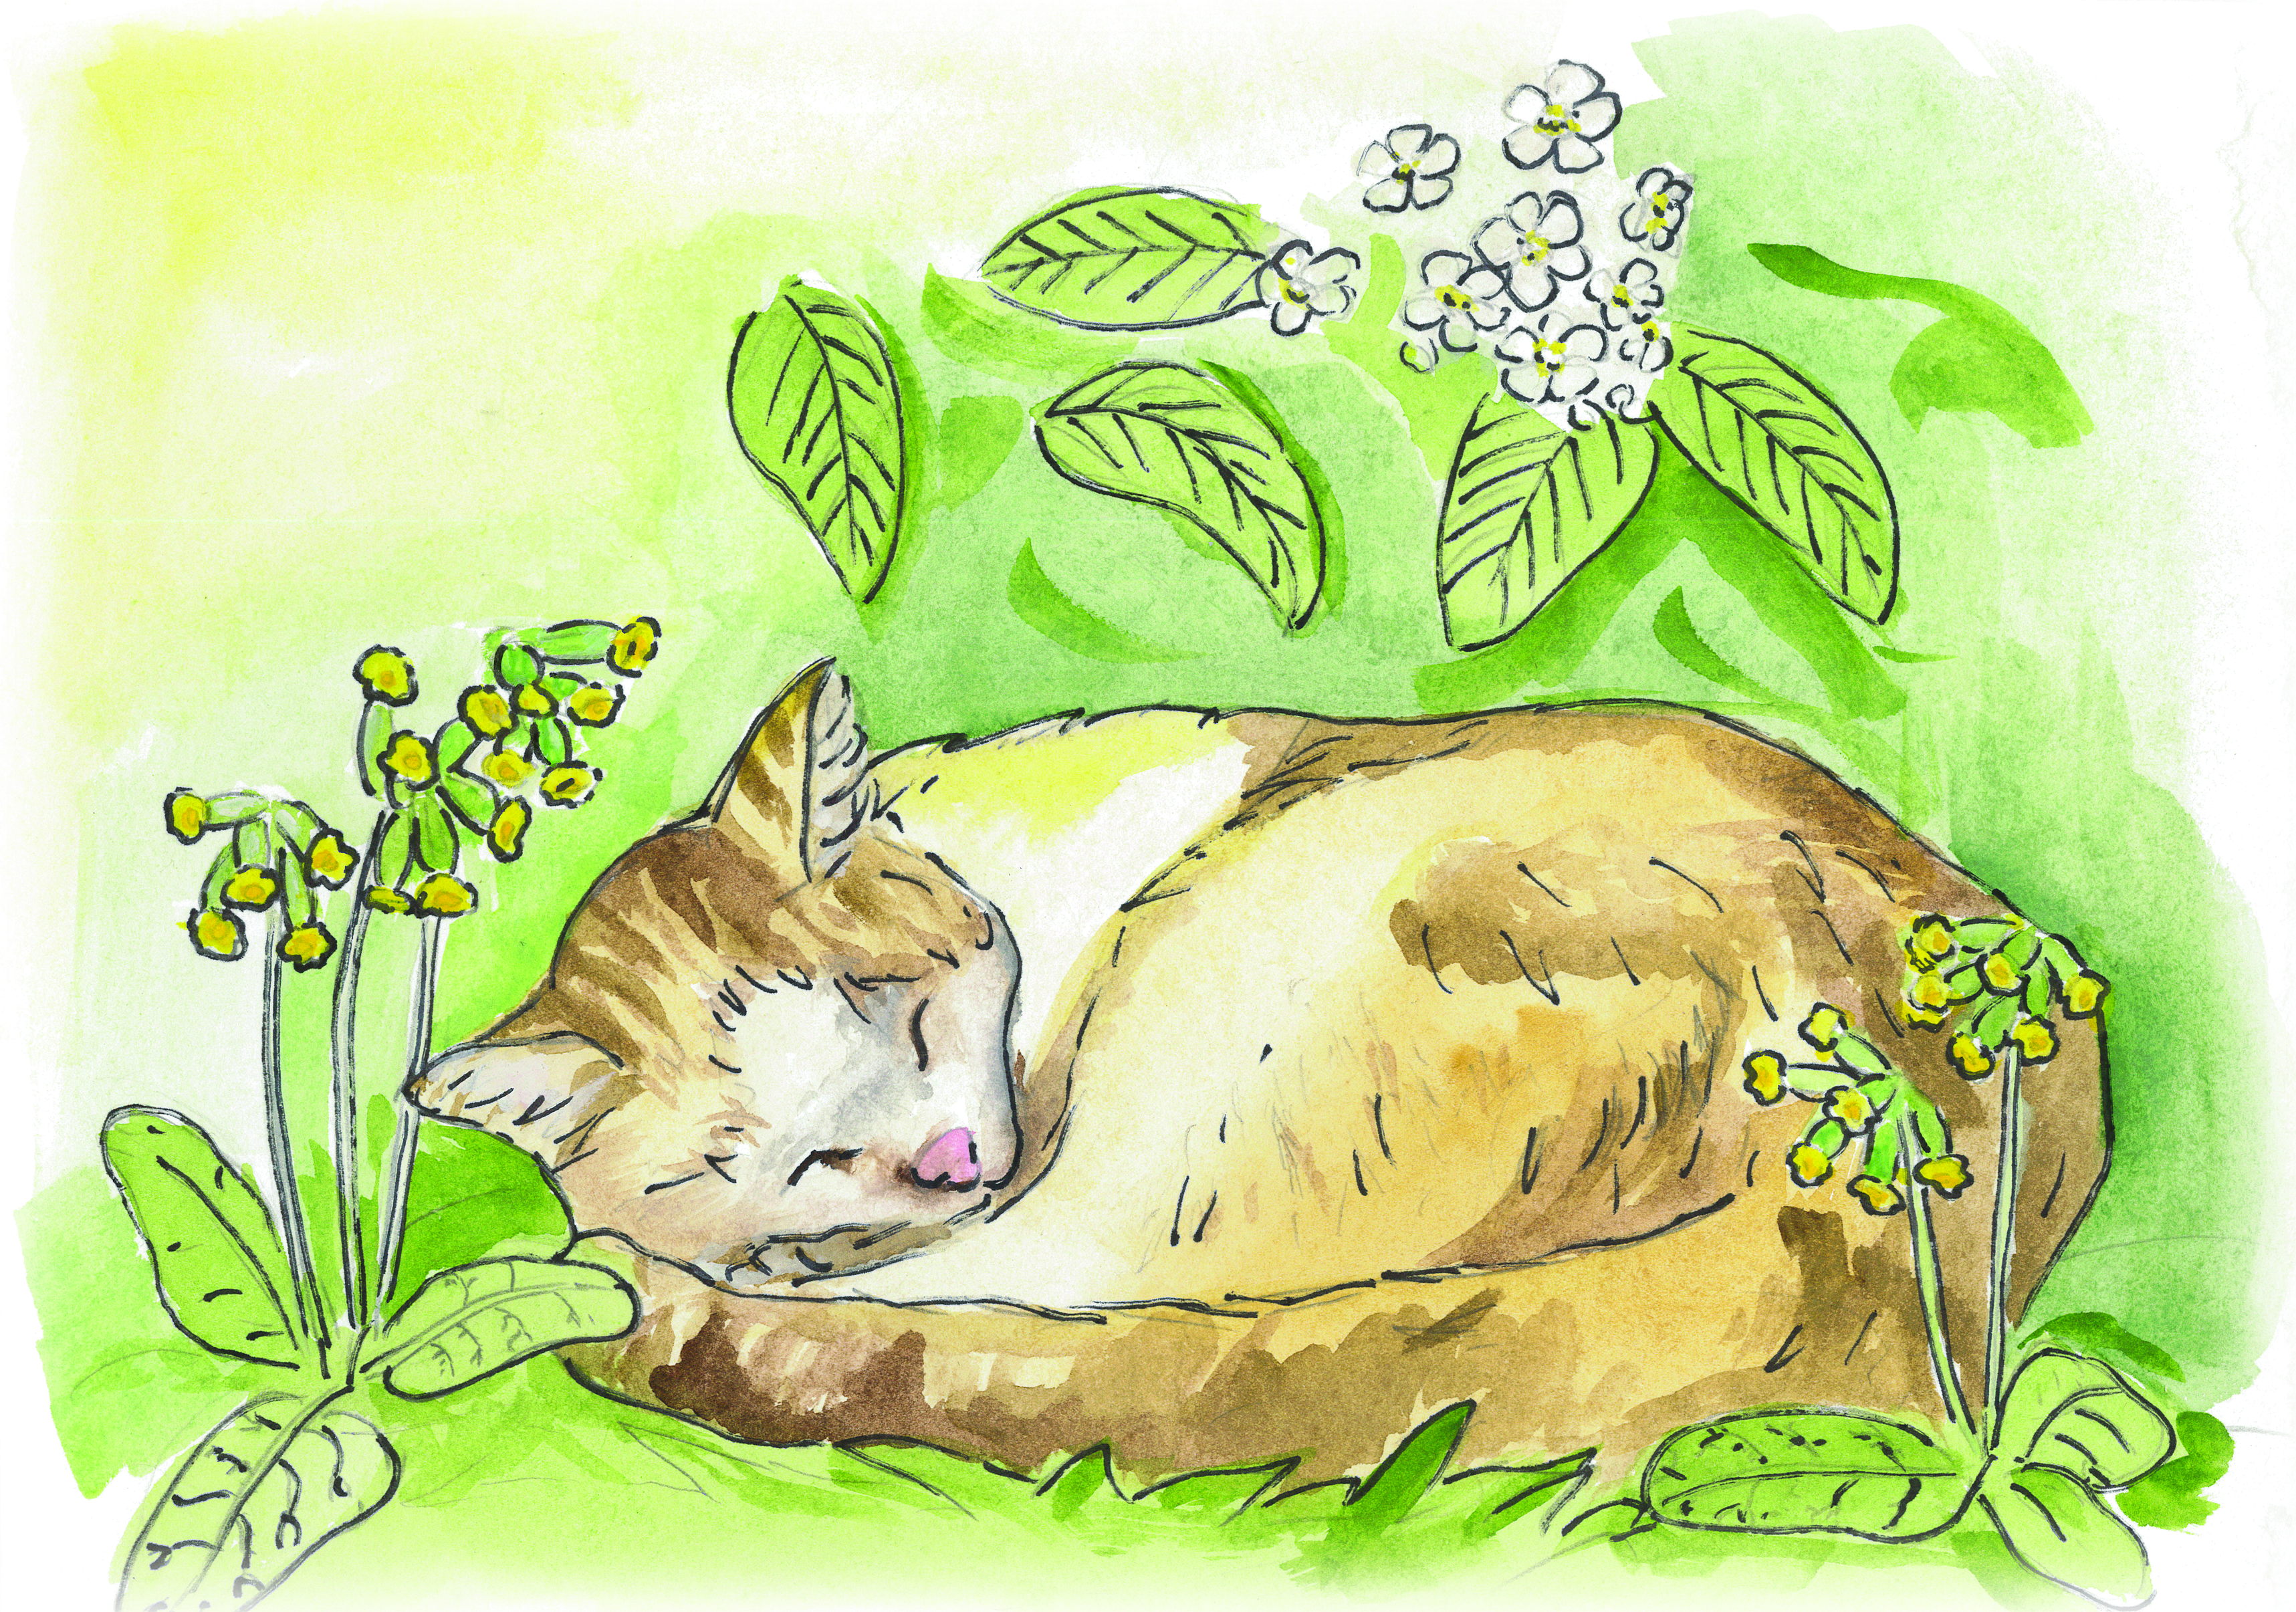 Pisine kass